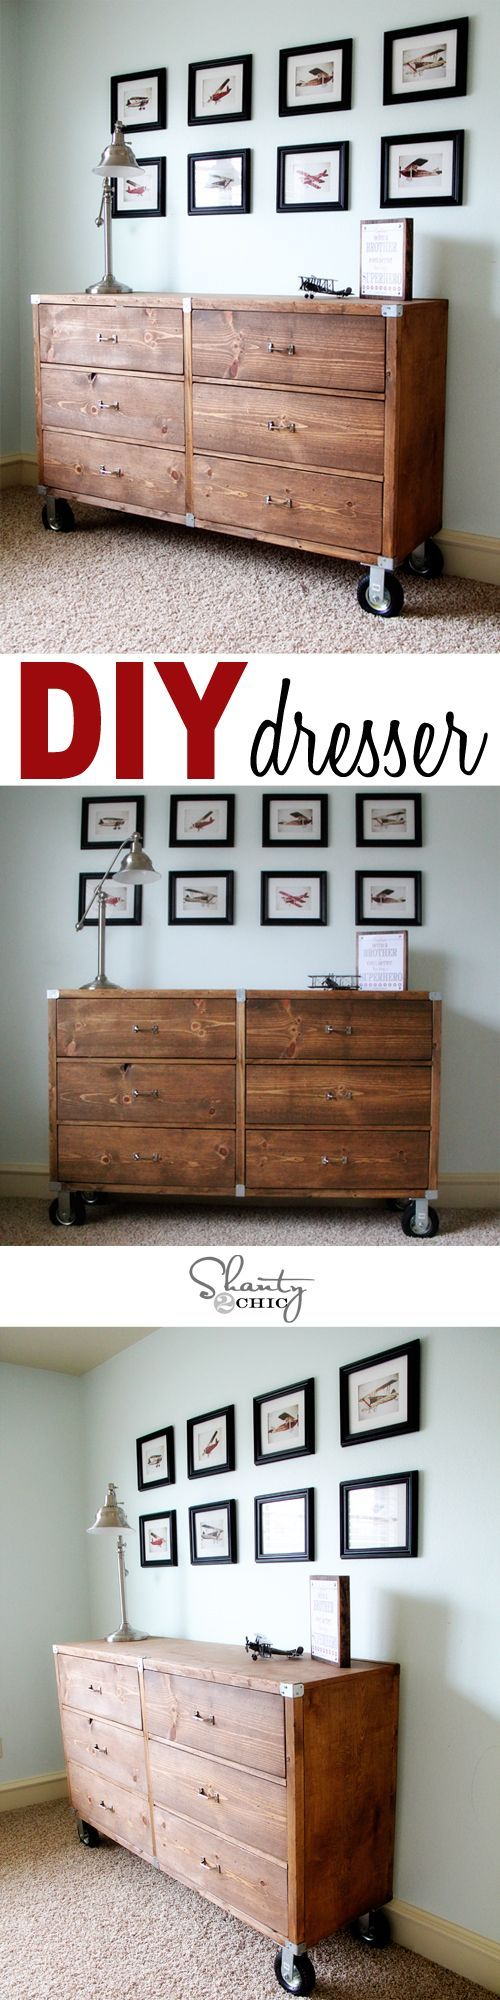 DIY Furniture - Wood Dresser with Wheels! | Diy furniture ...